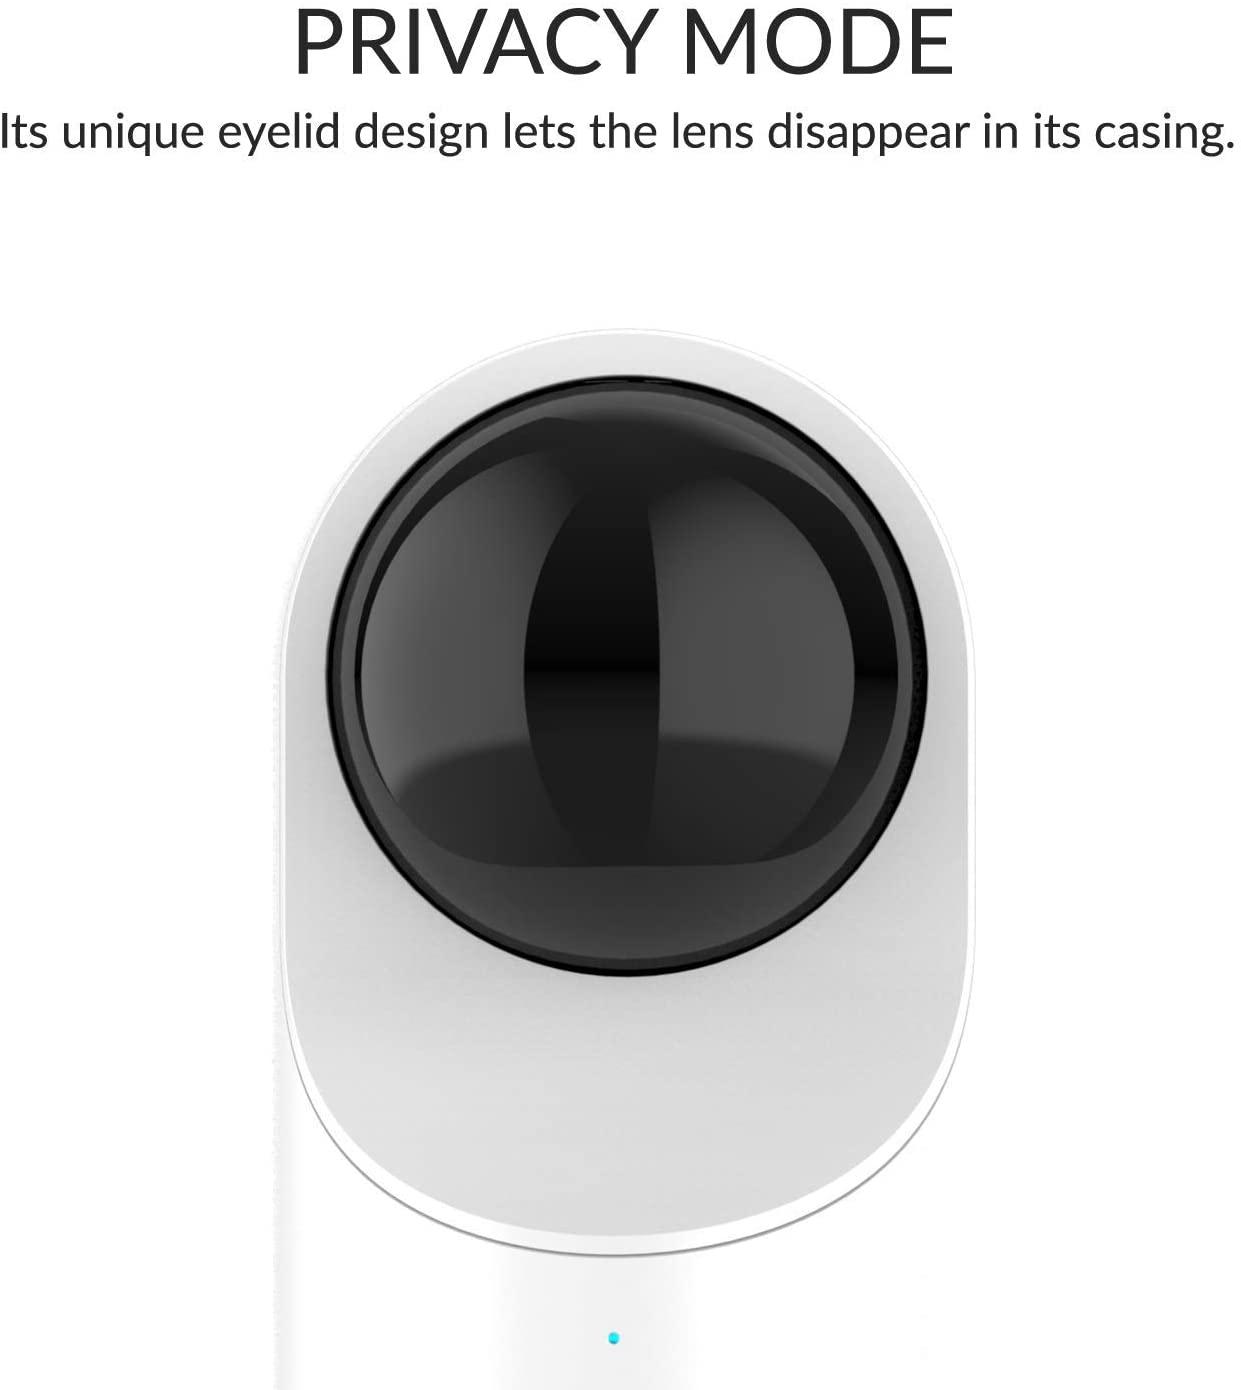 YI Smart Dome Camera privacy mode